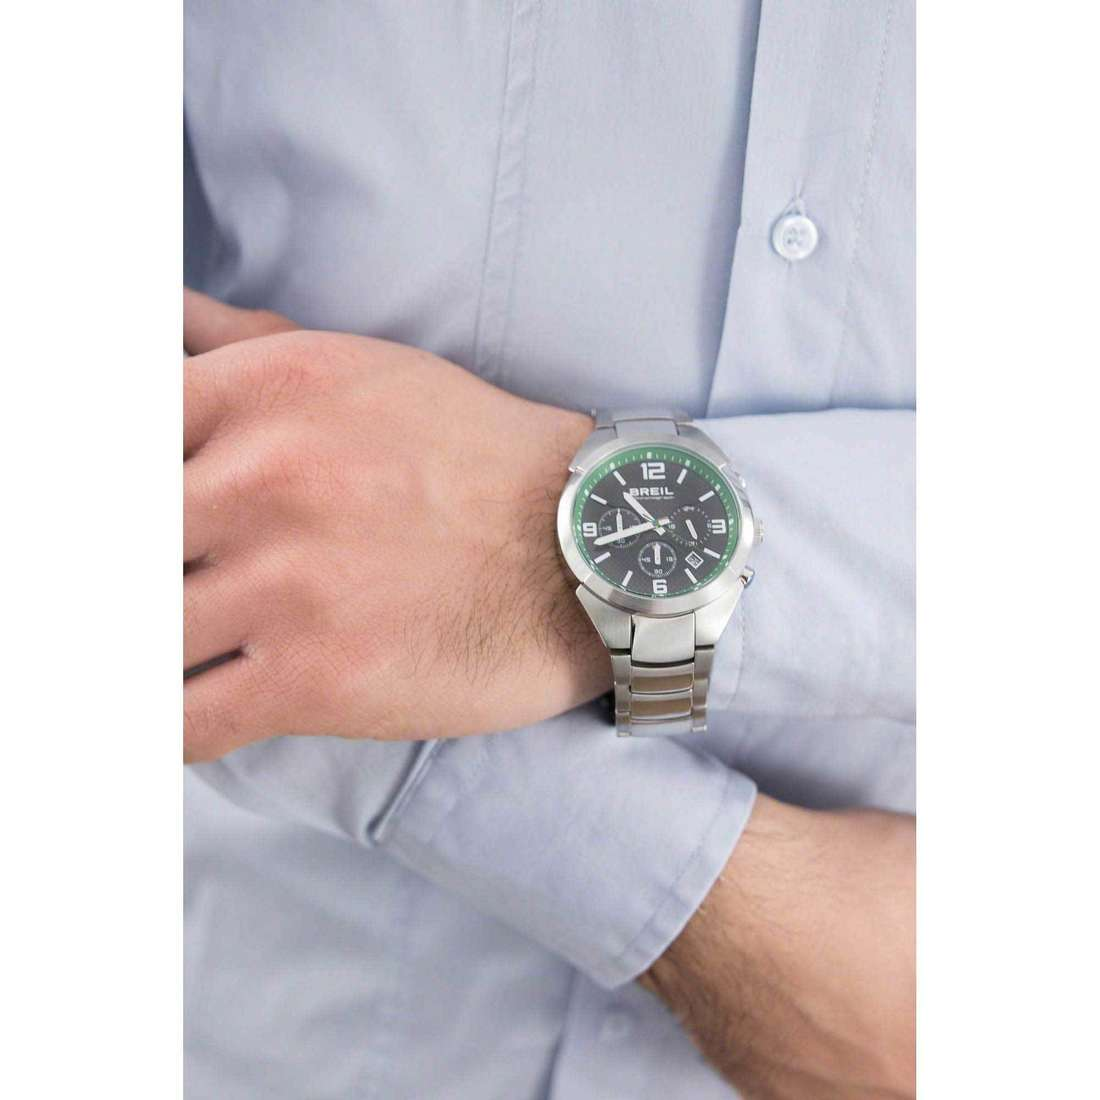 Breil cronografi Gap uomo TW1380 indosso